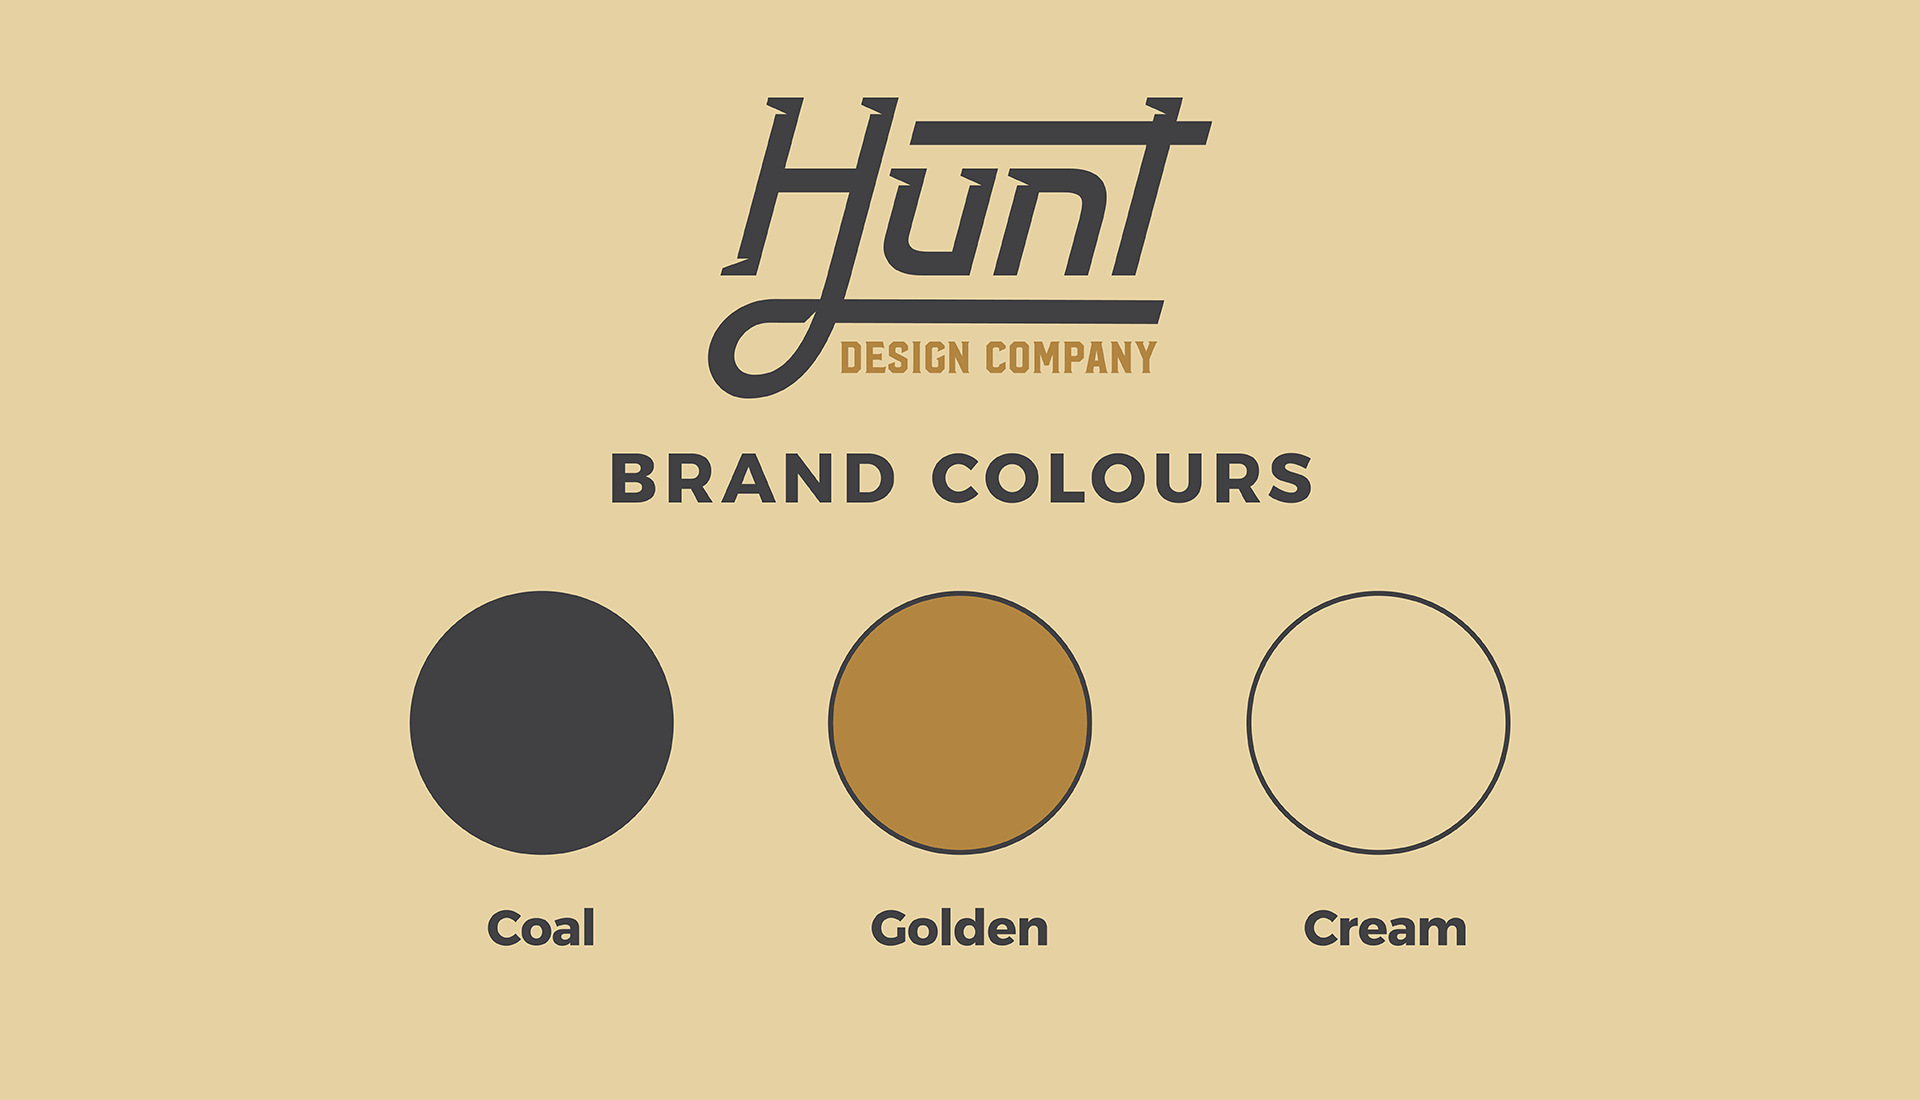 Hunt Design Co.   Brand Identity Colours, Coal, Golden, Cream